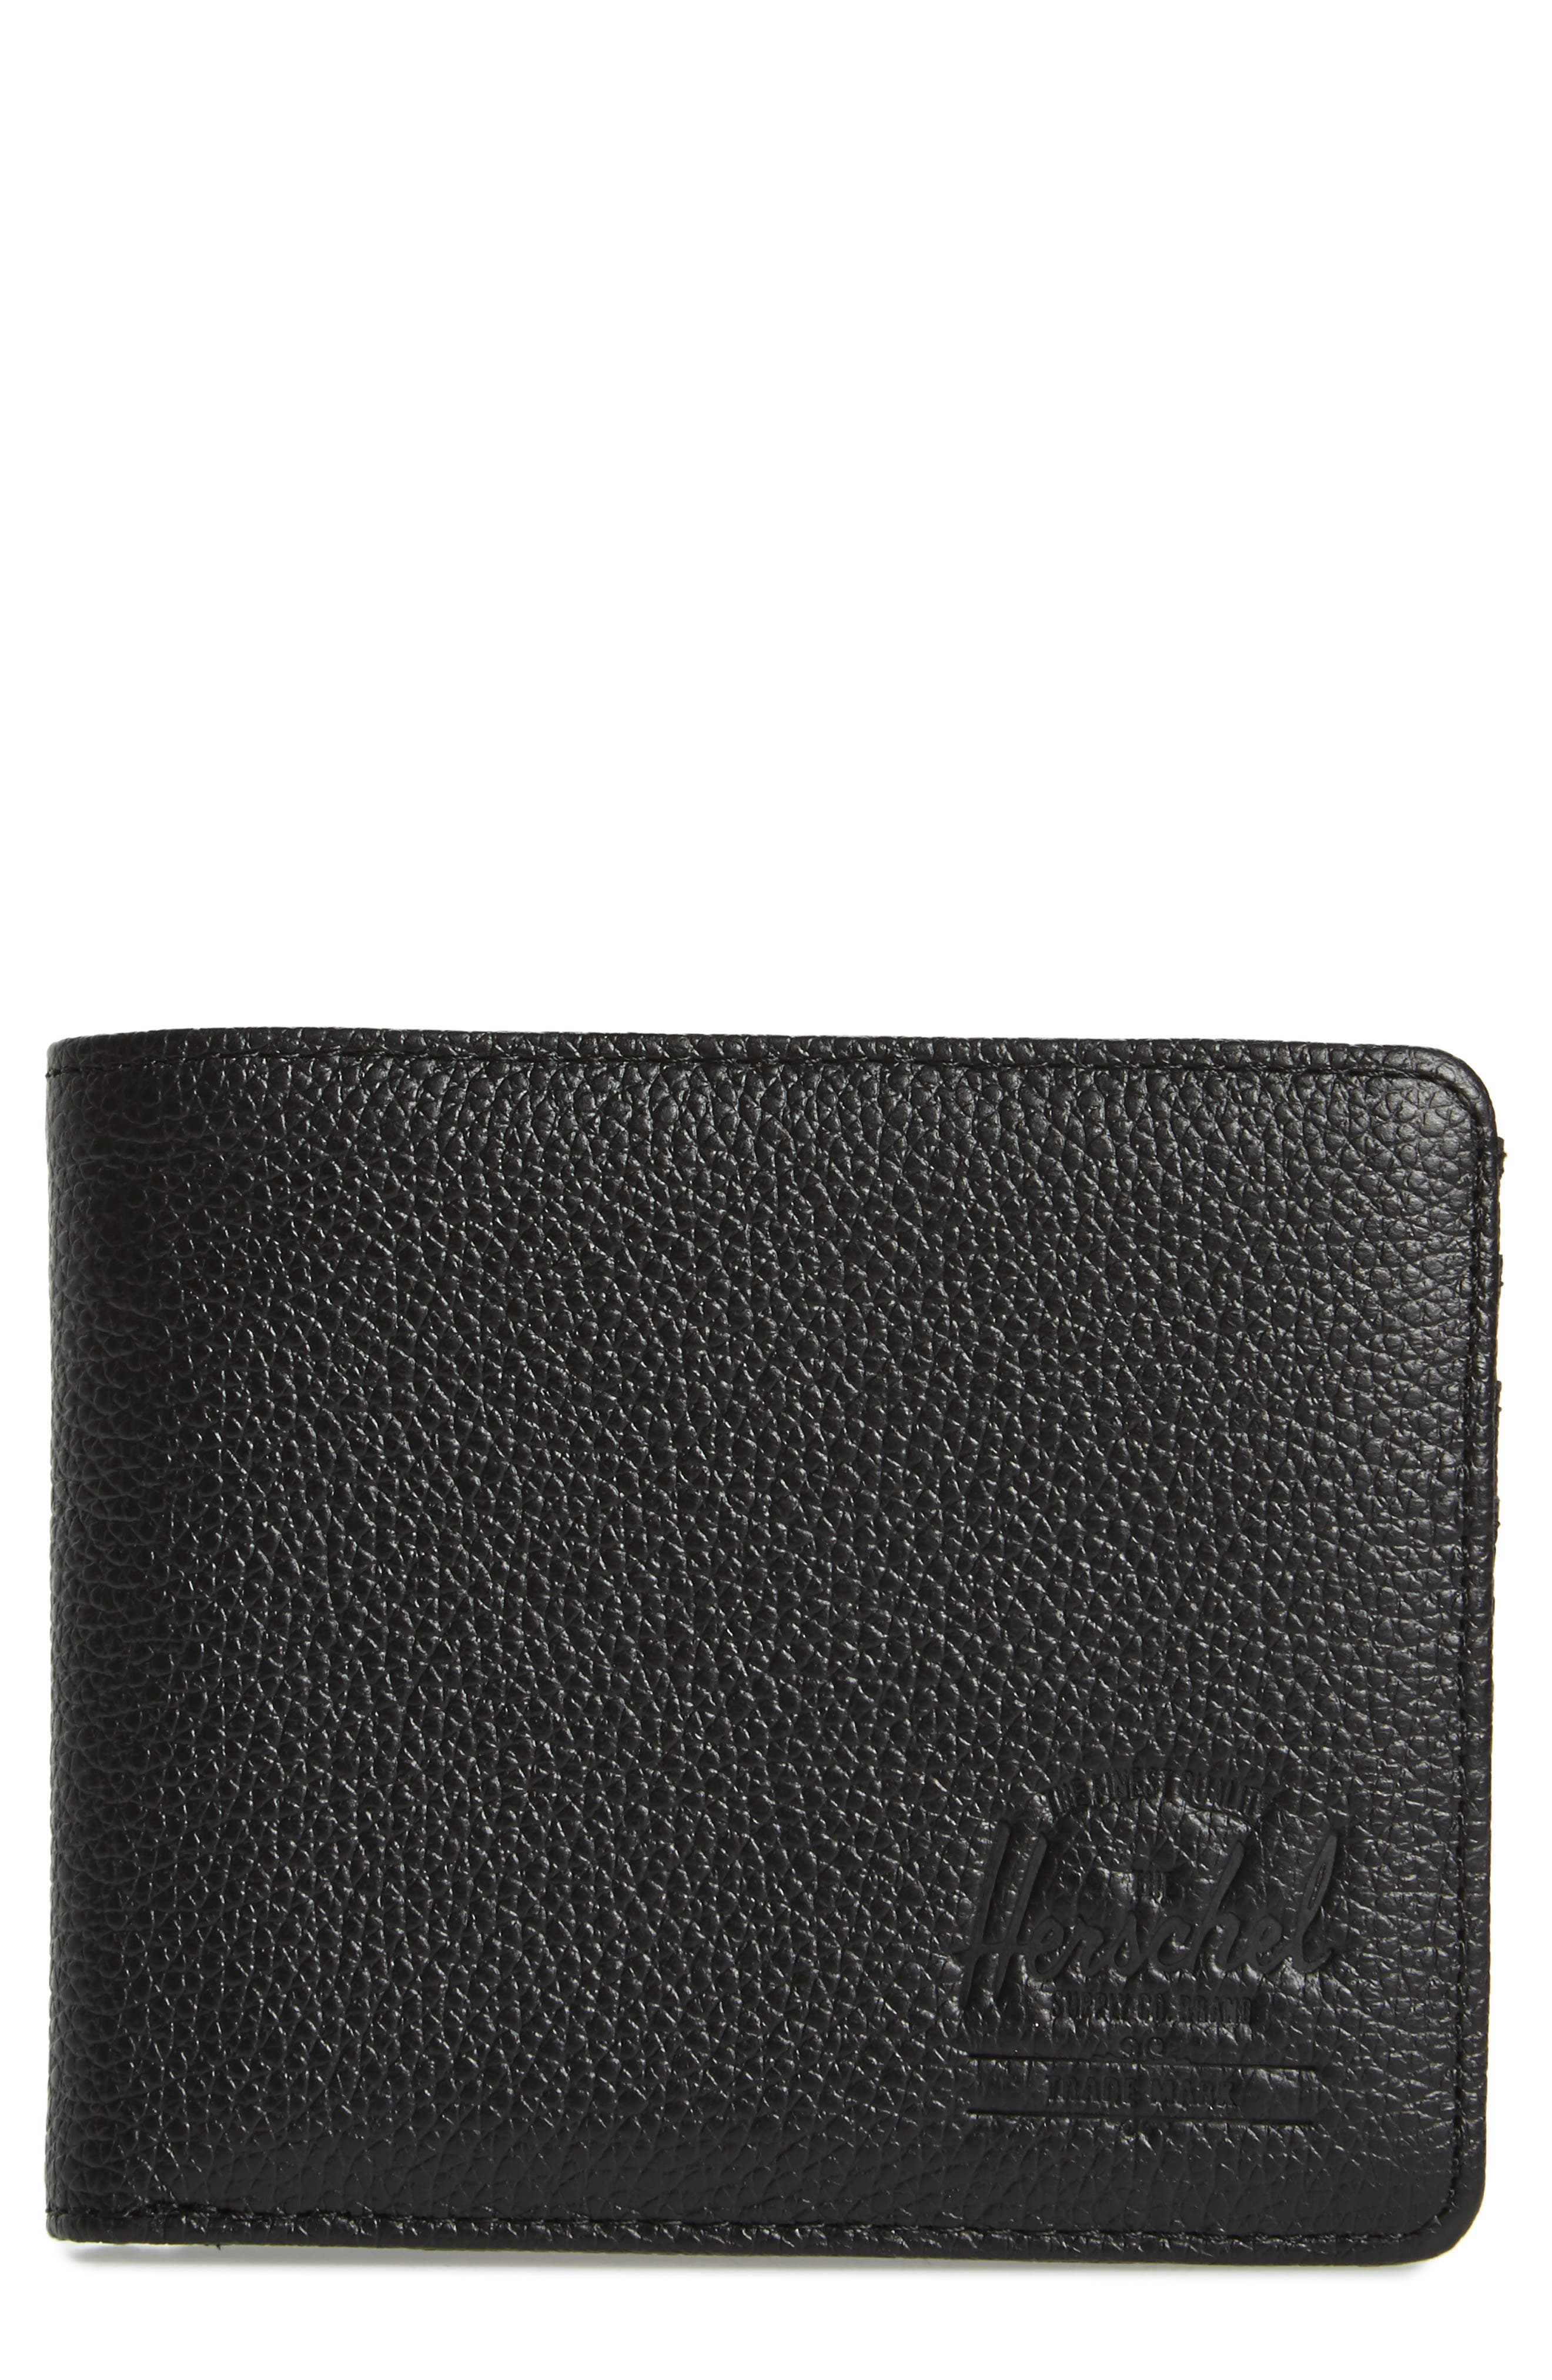 Tile Roy Leather Bifold Wallet,                         Main,                         color, Black Pebbled Leather